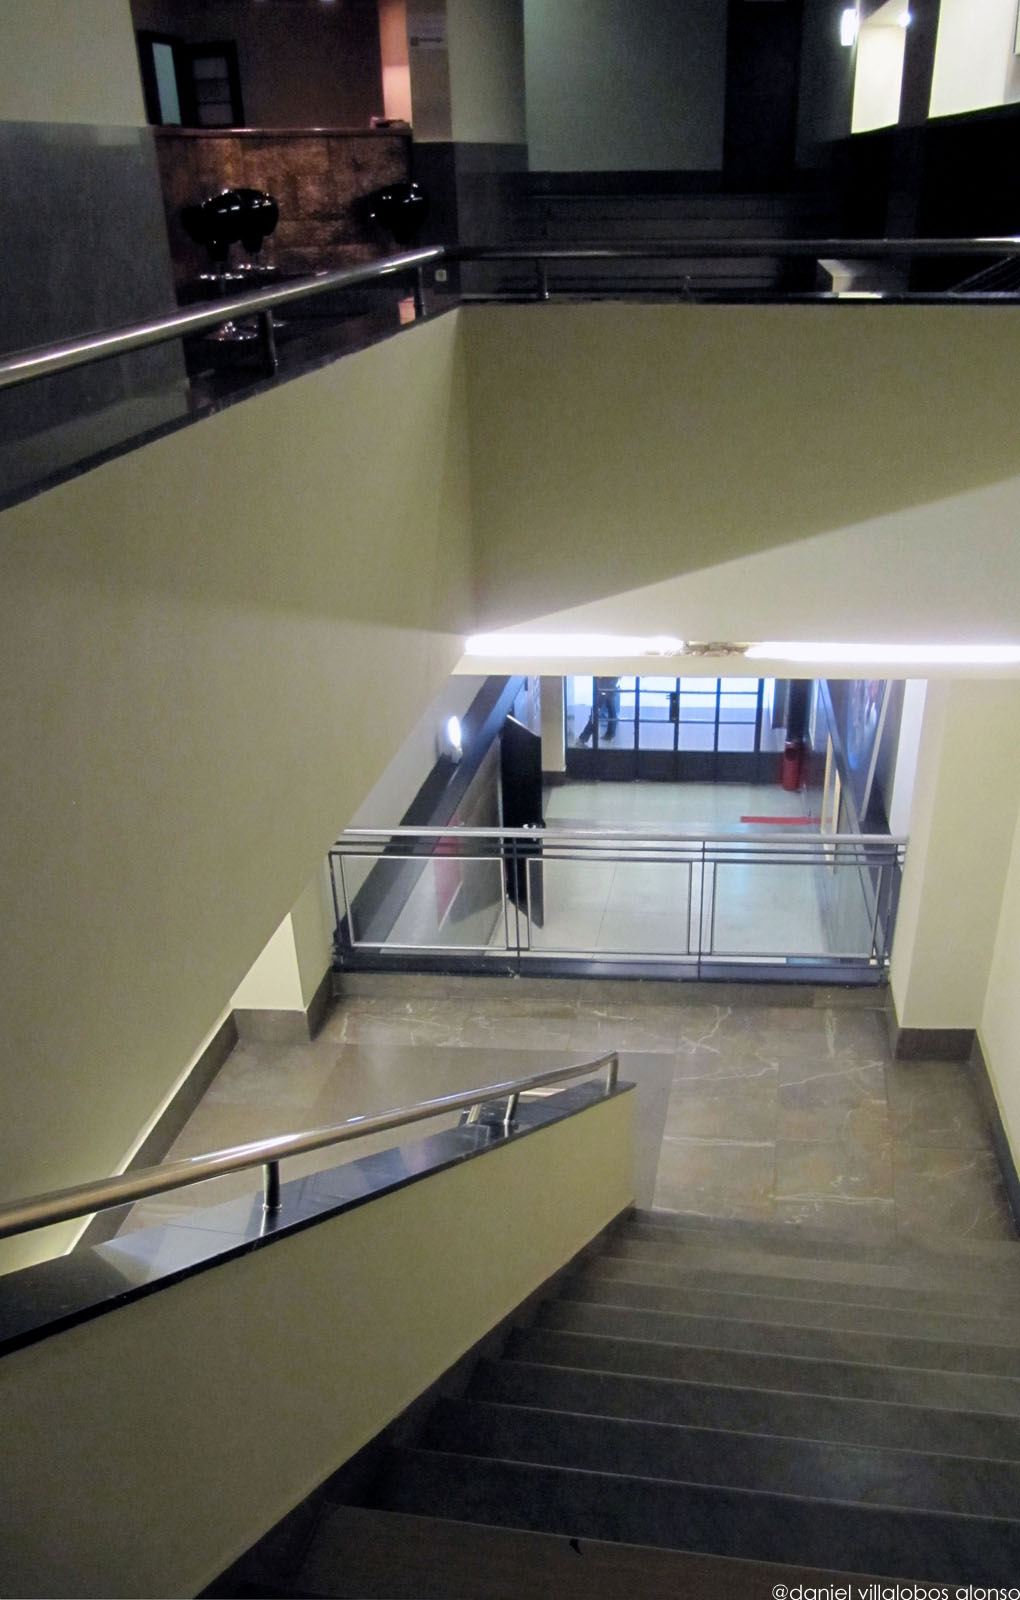 danielvillalobos-cines-digitalphotographies-modernarchitecture-25